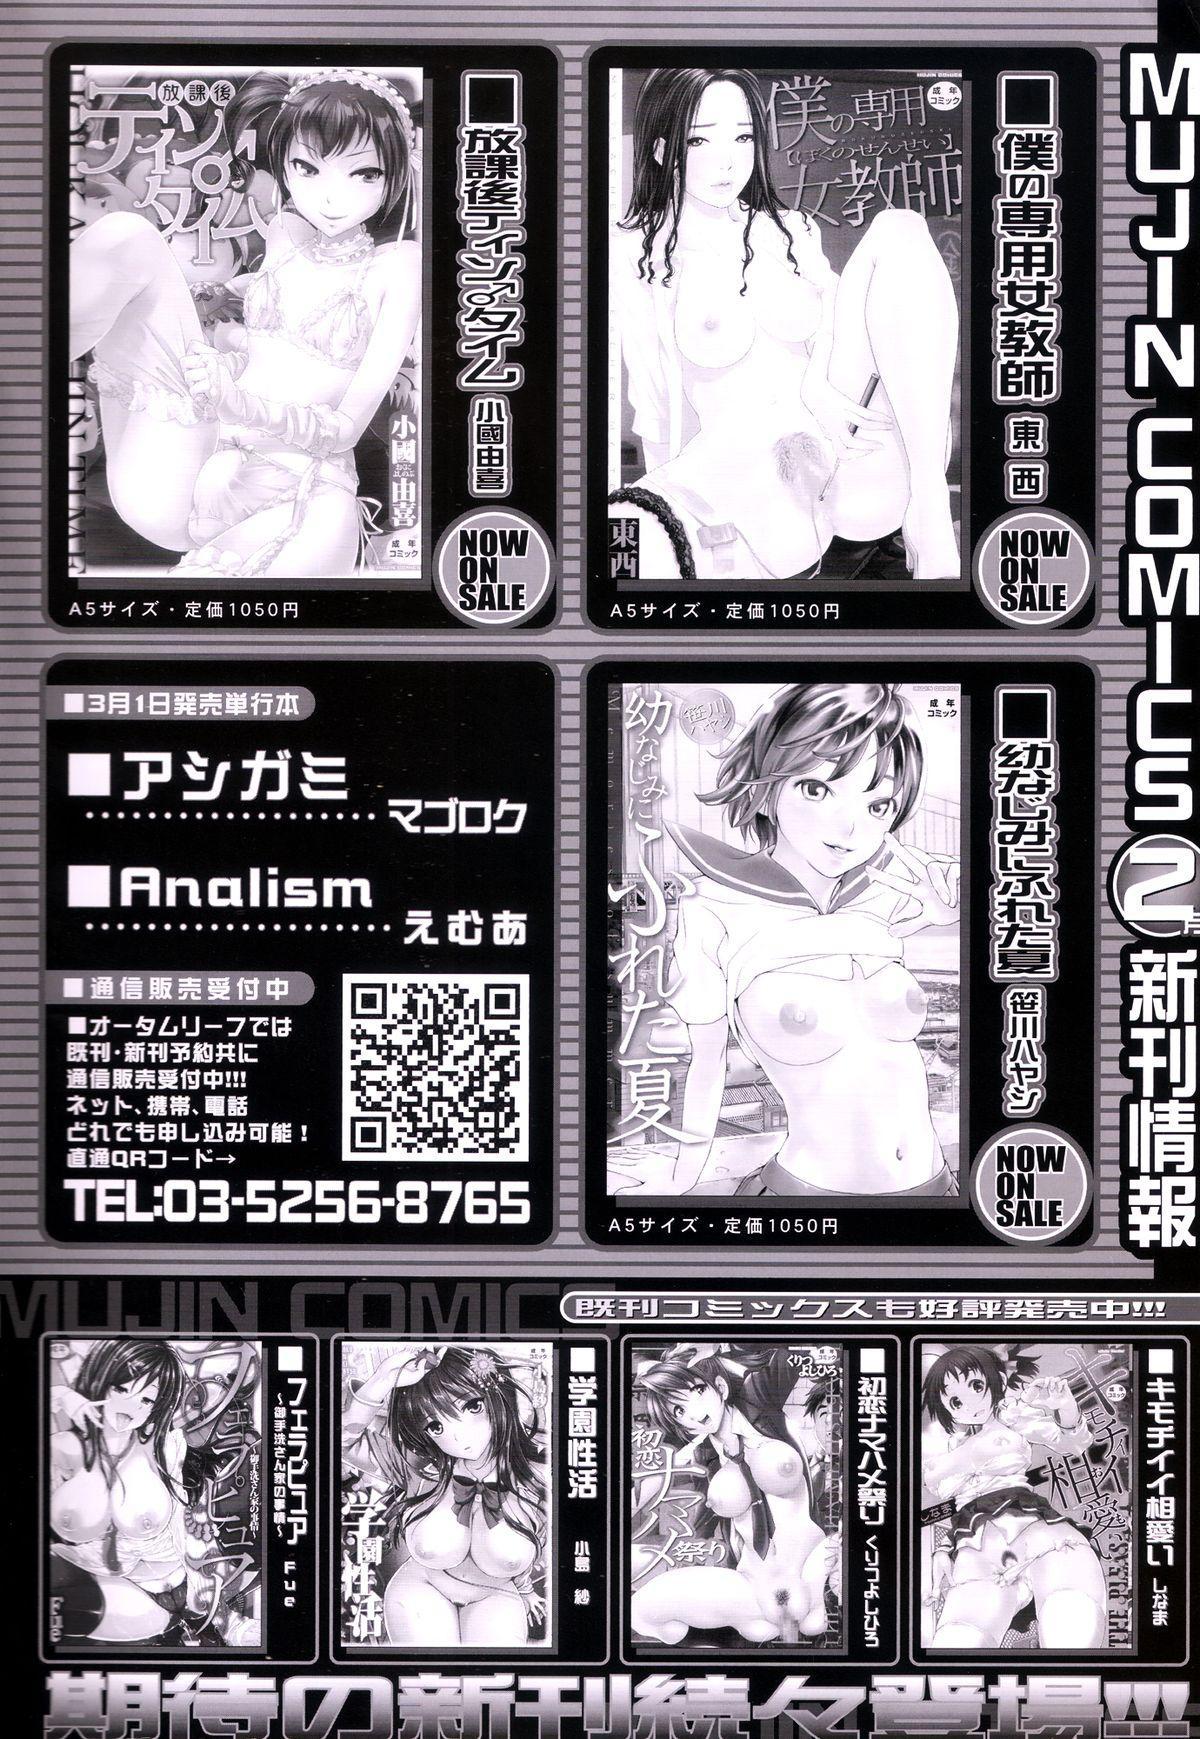 COMIC MILF 2013-02 Vol. 11 1